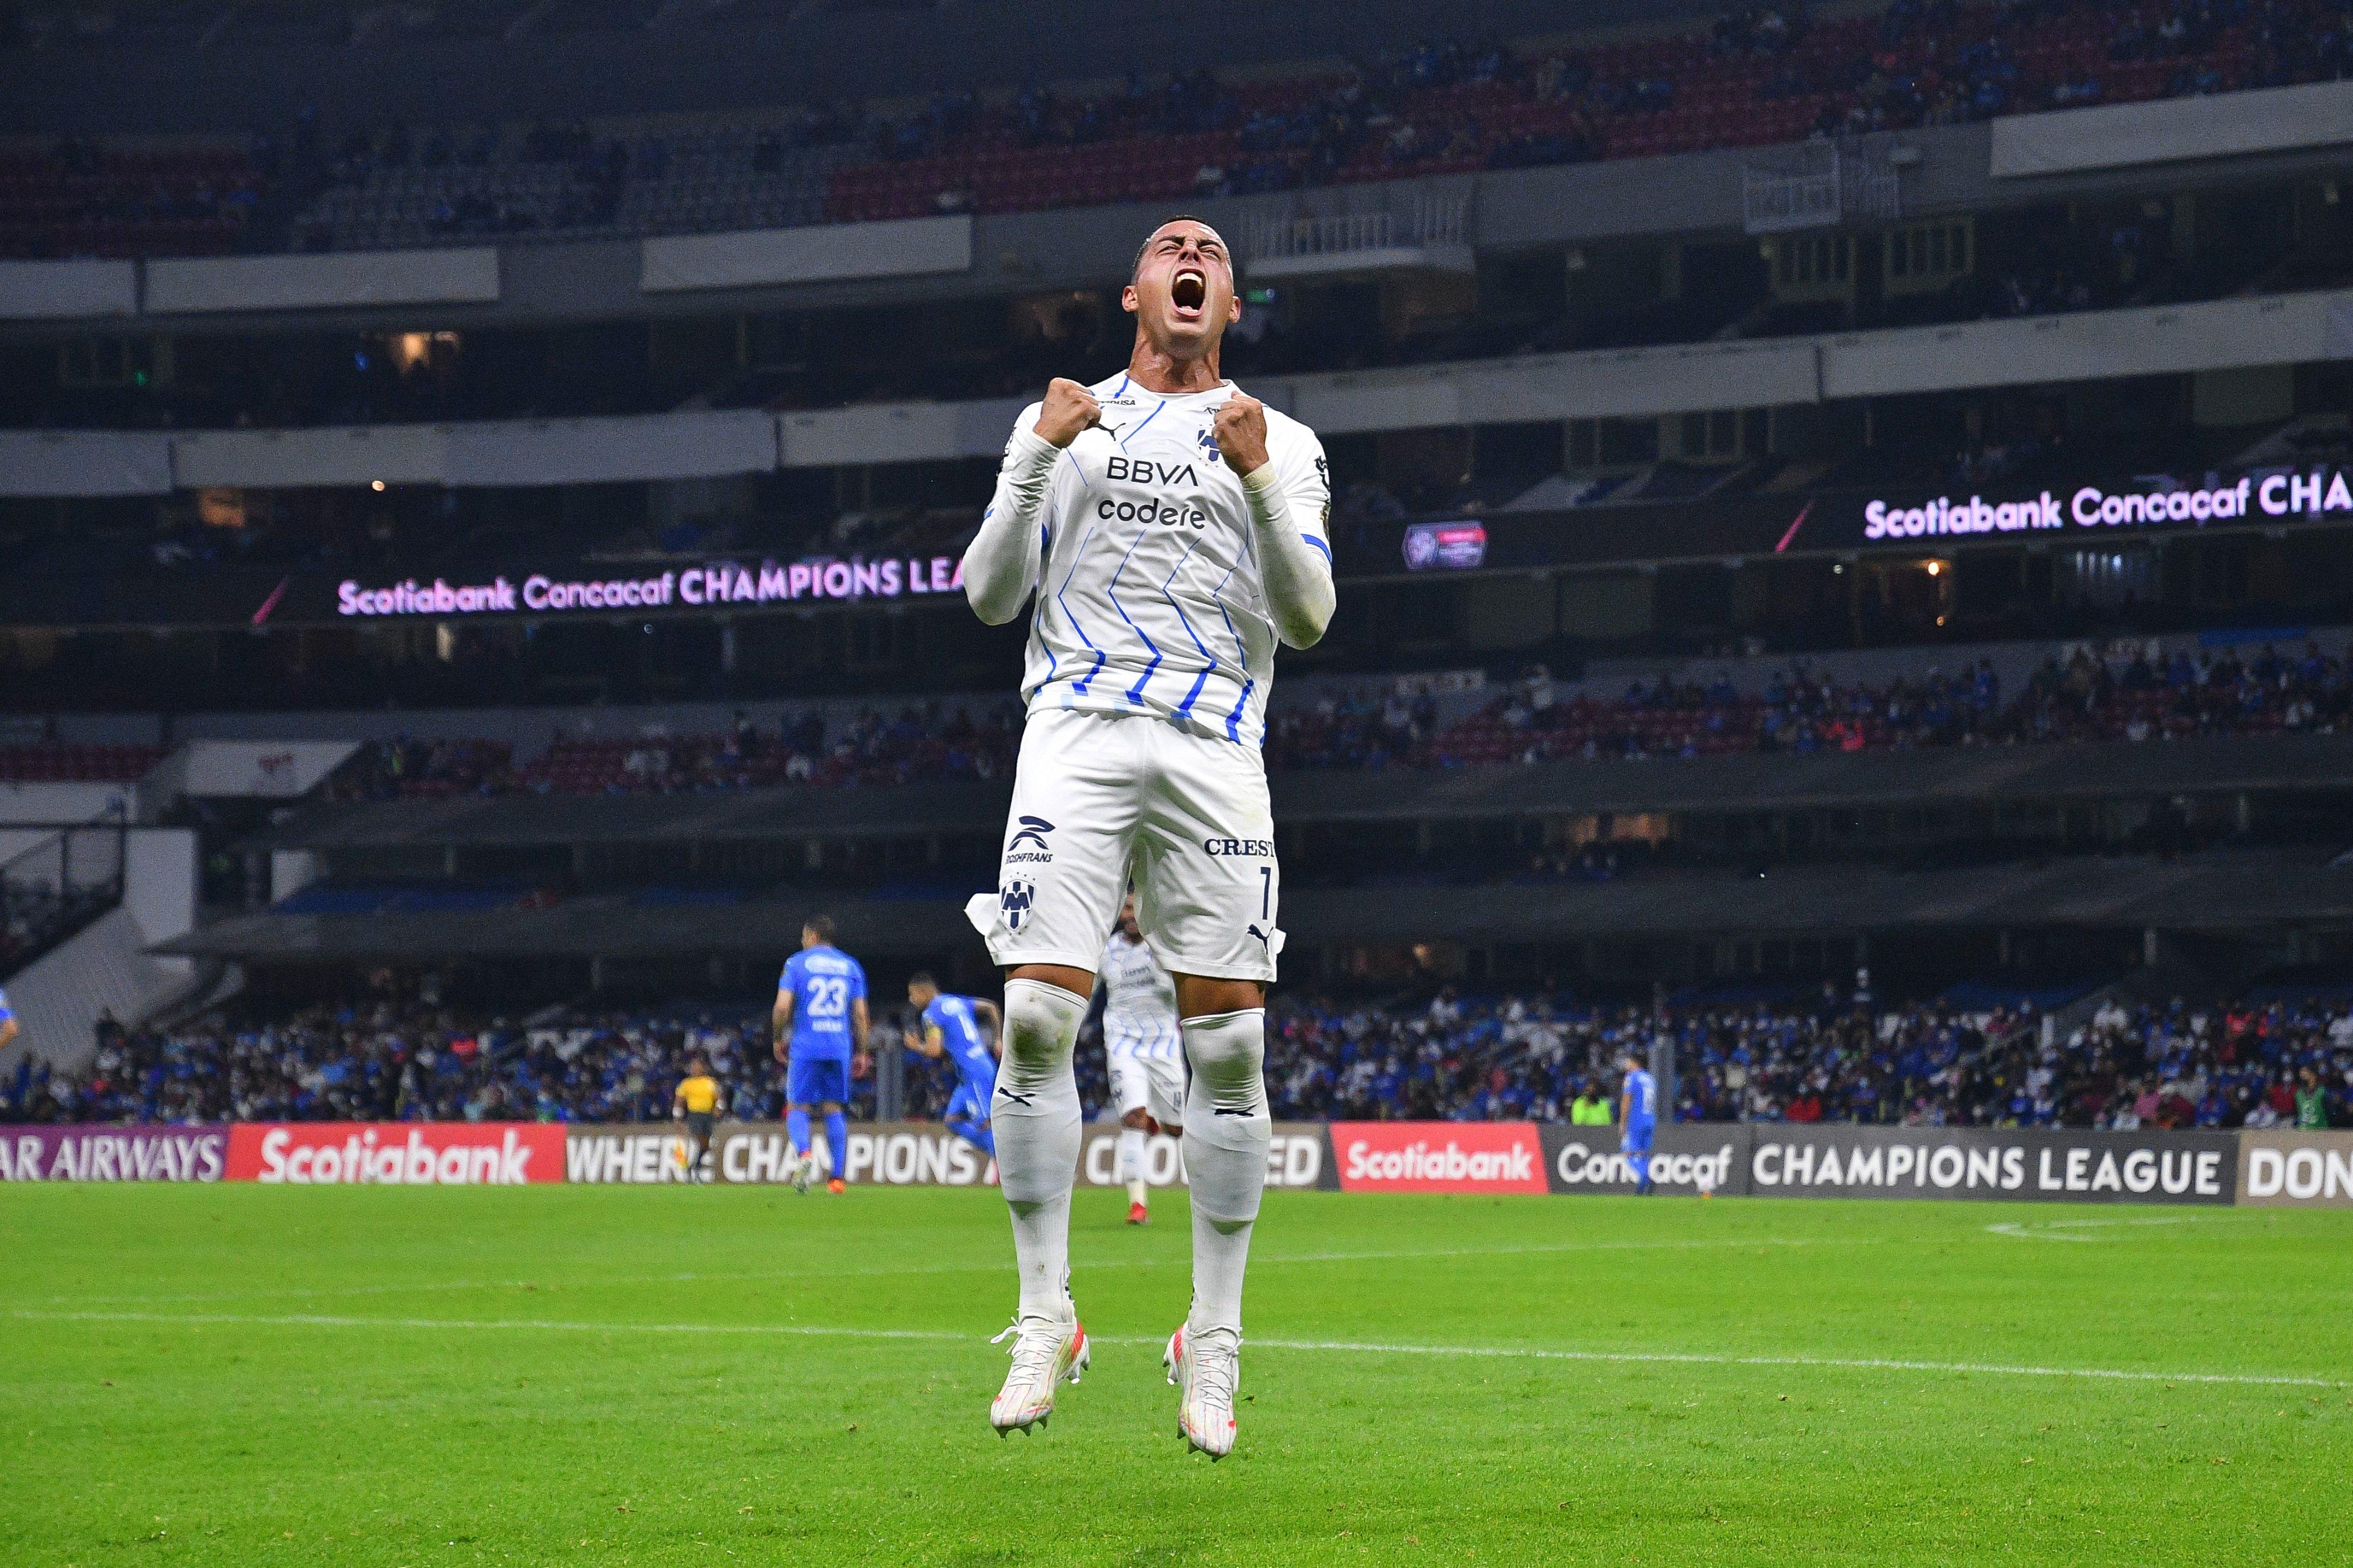 Cruz Azul vs Monterrey 1-4 CONCACAF Champions League 2021